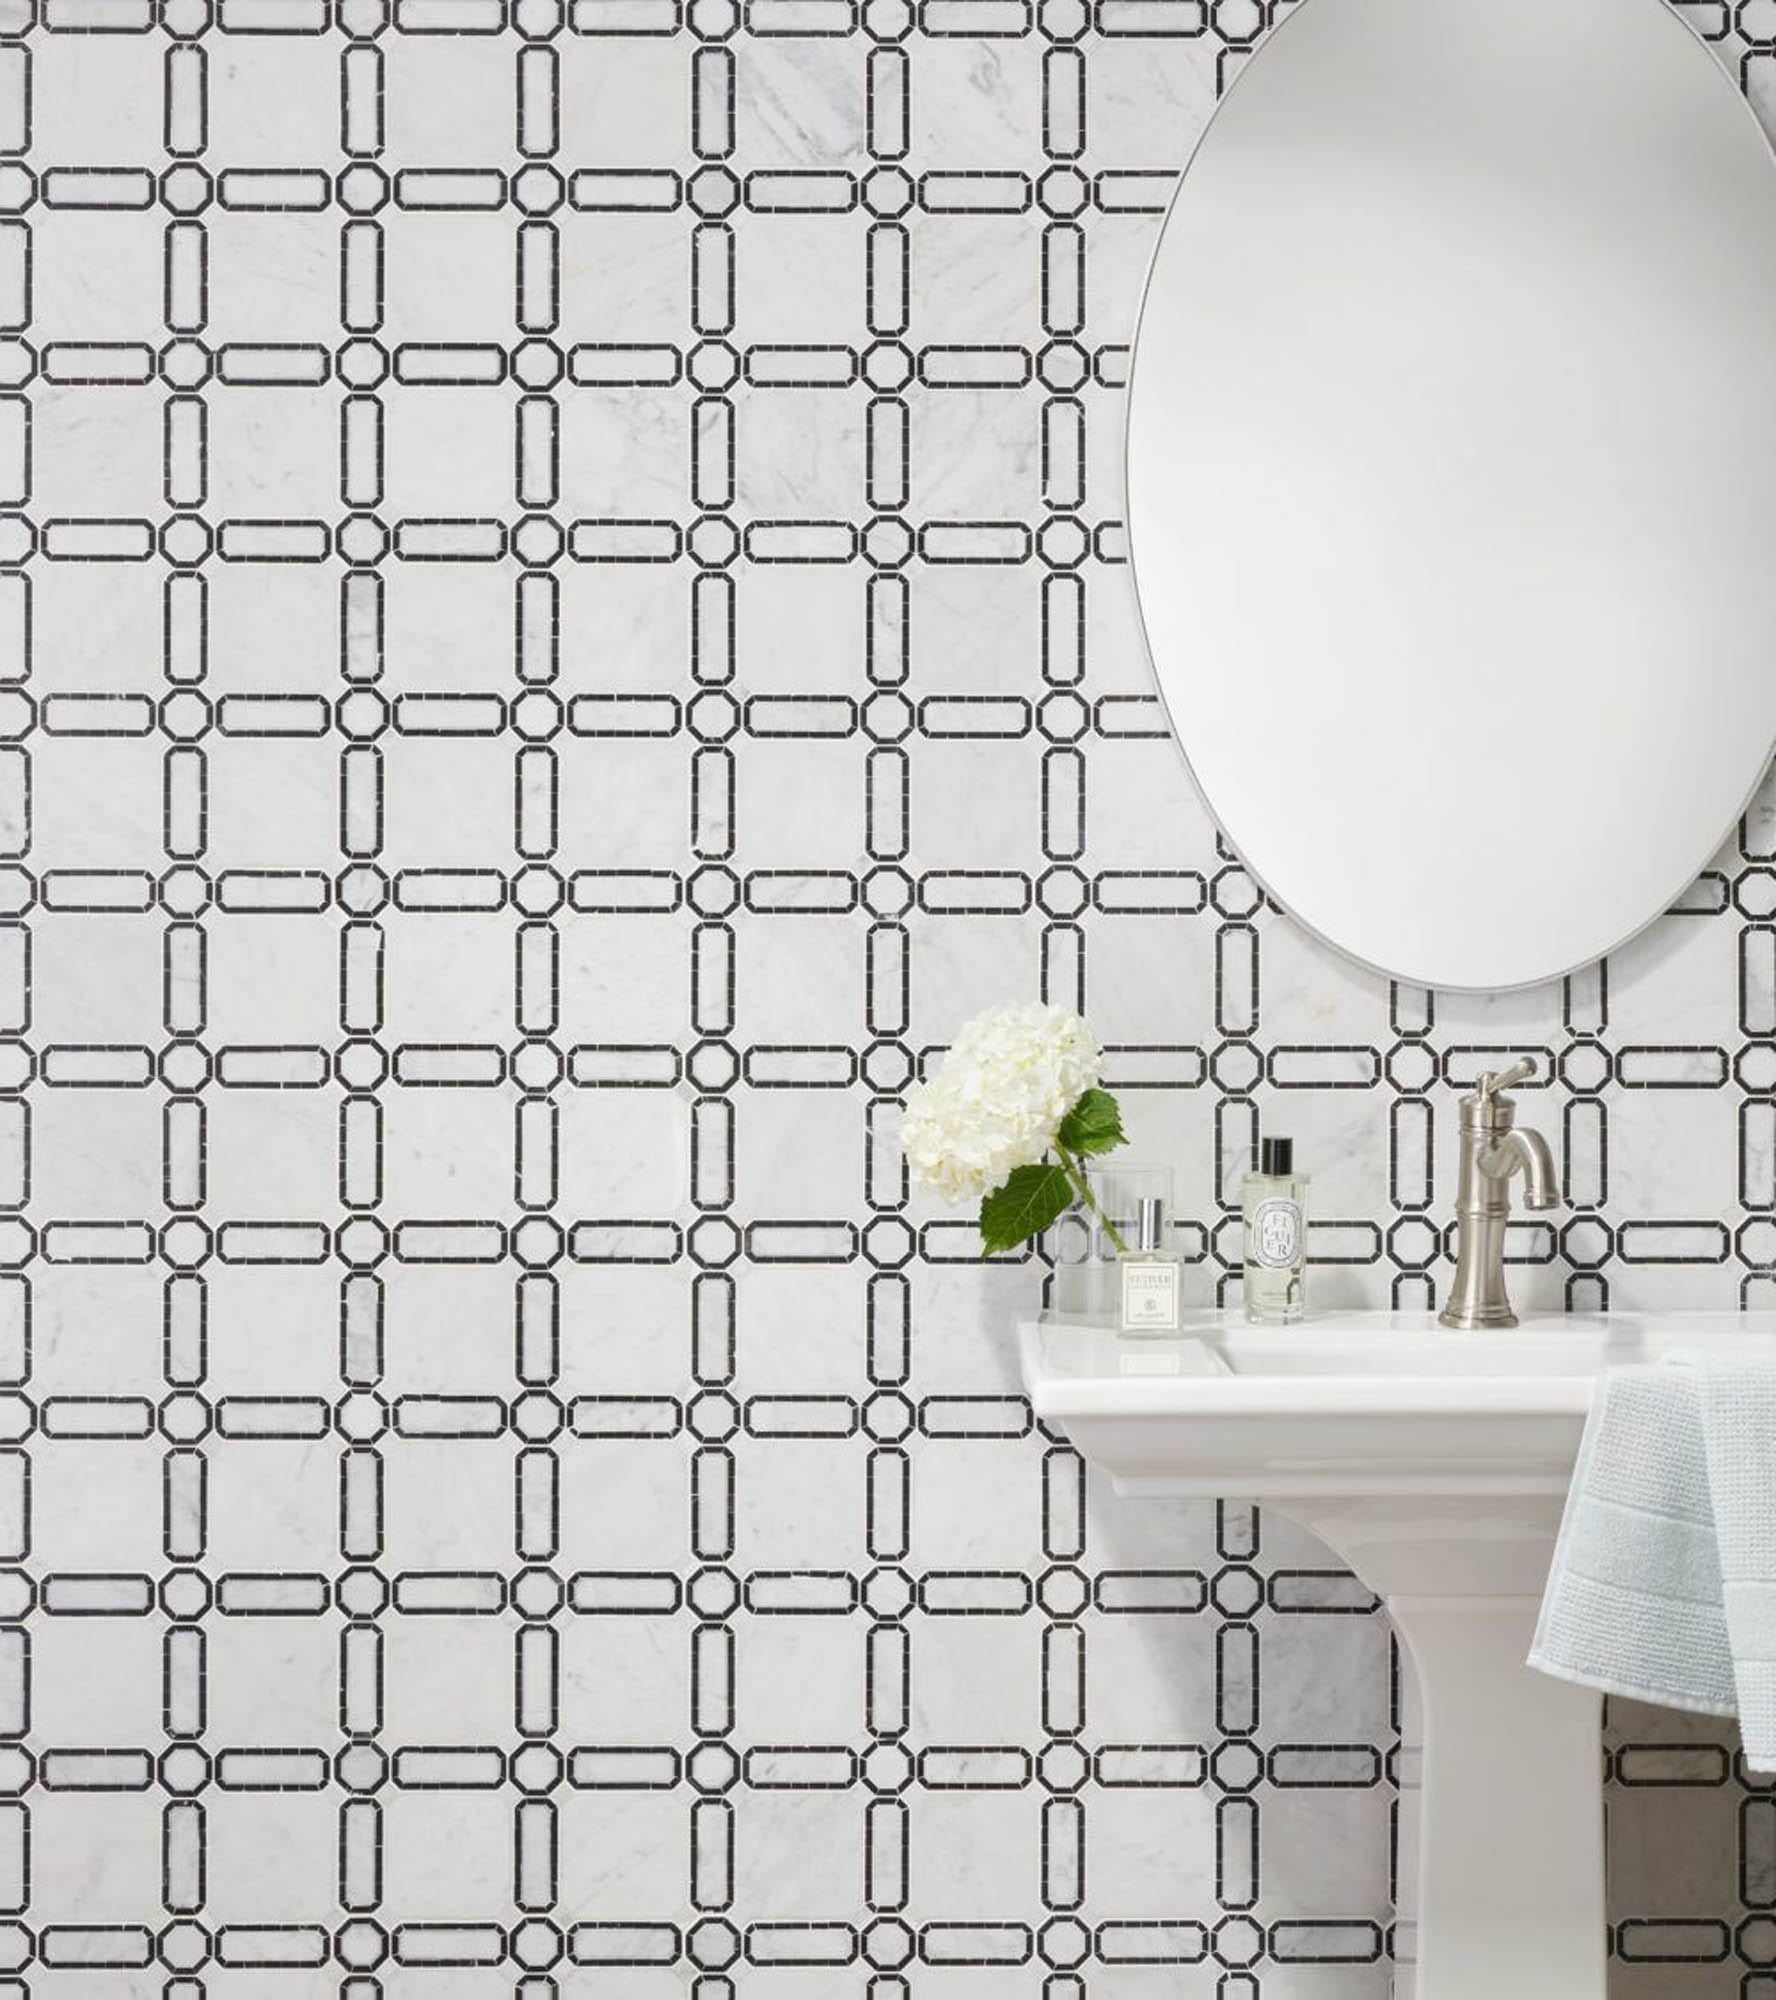 Mosaic tile wallpaper effect